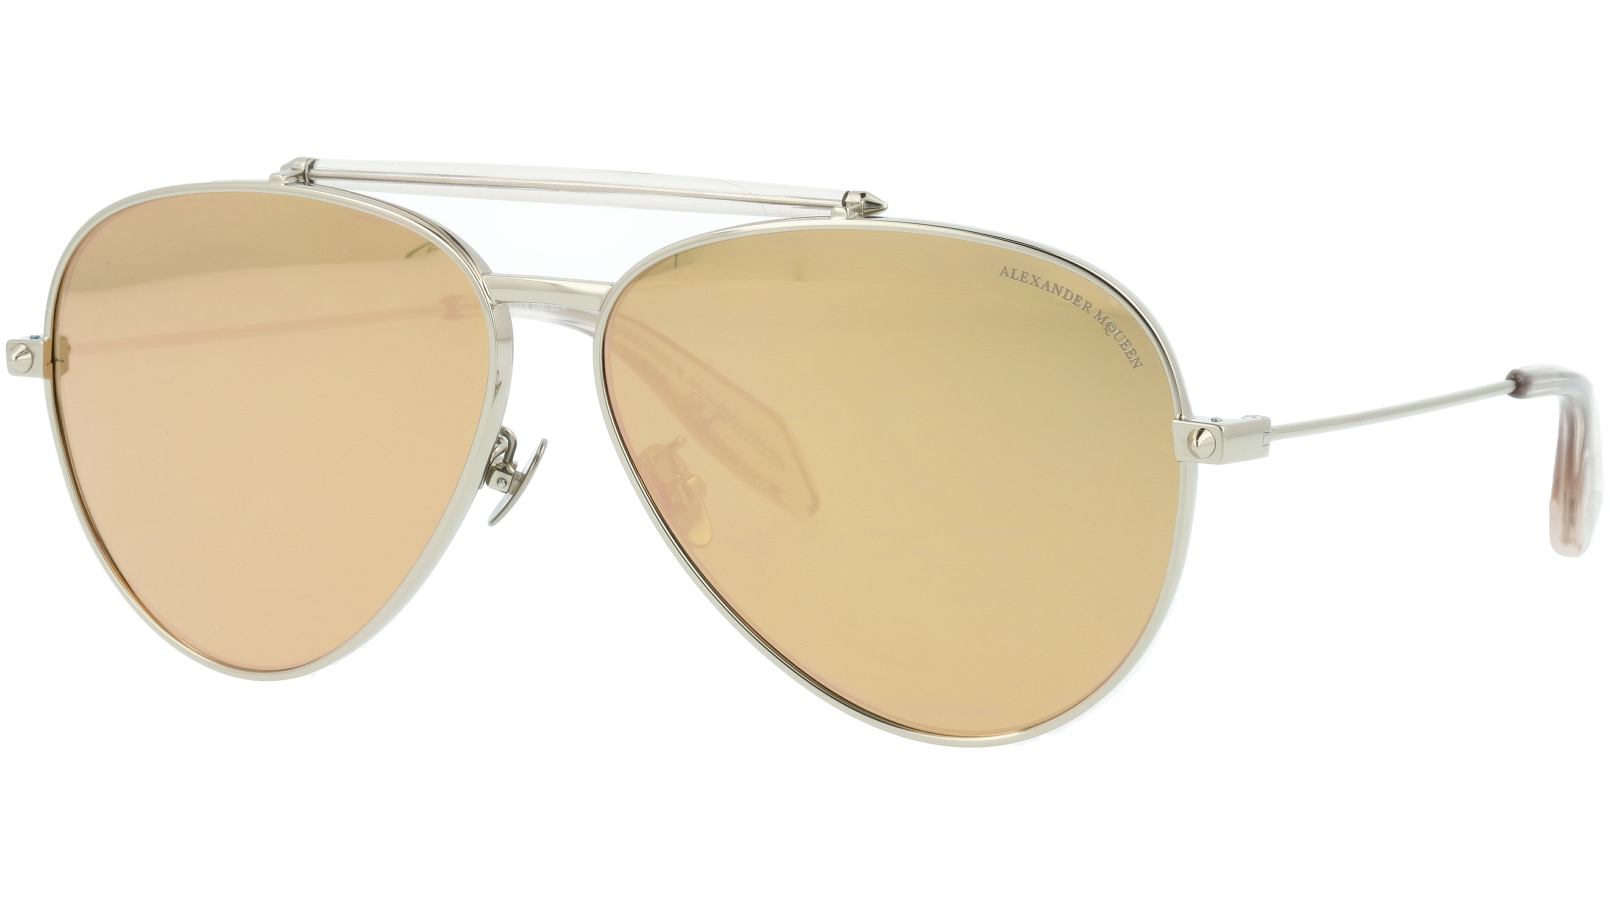 ALEXANDER MCQUEEN AM0057S 005 52 SILVER Sunglasses